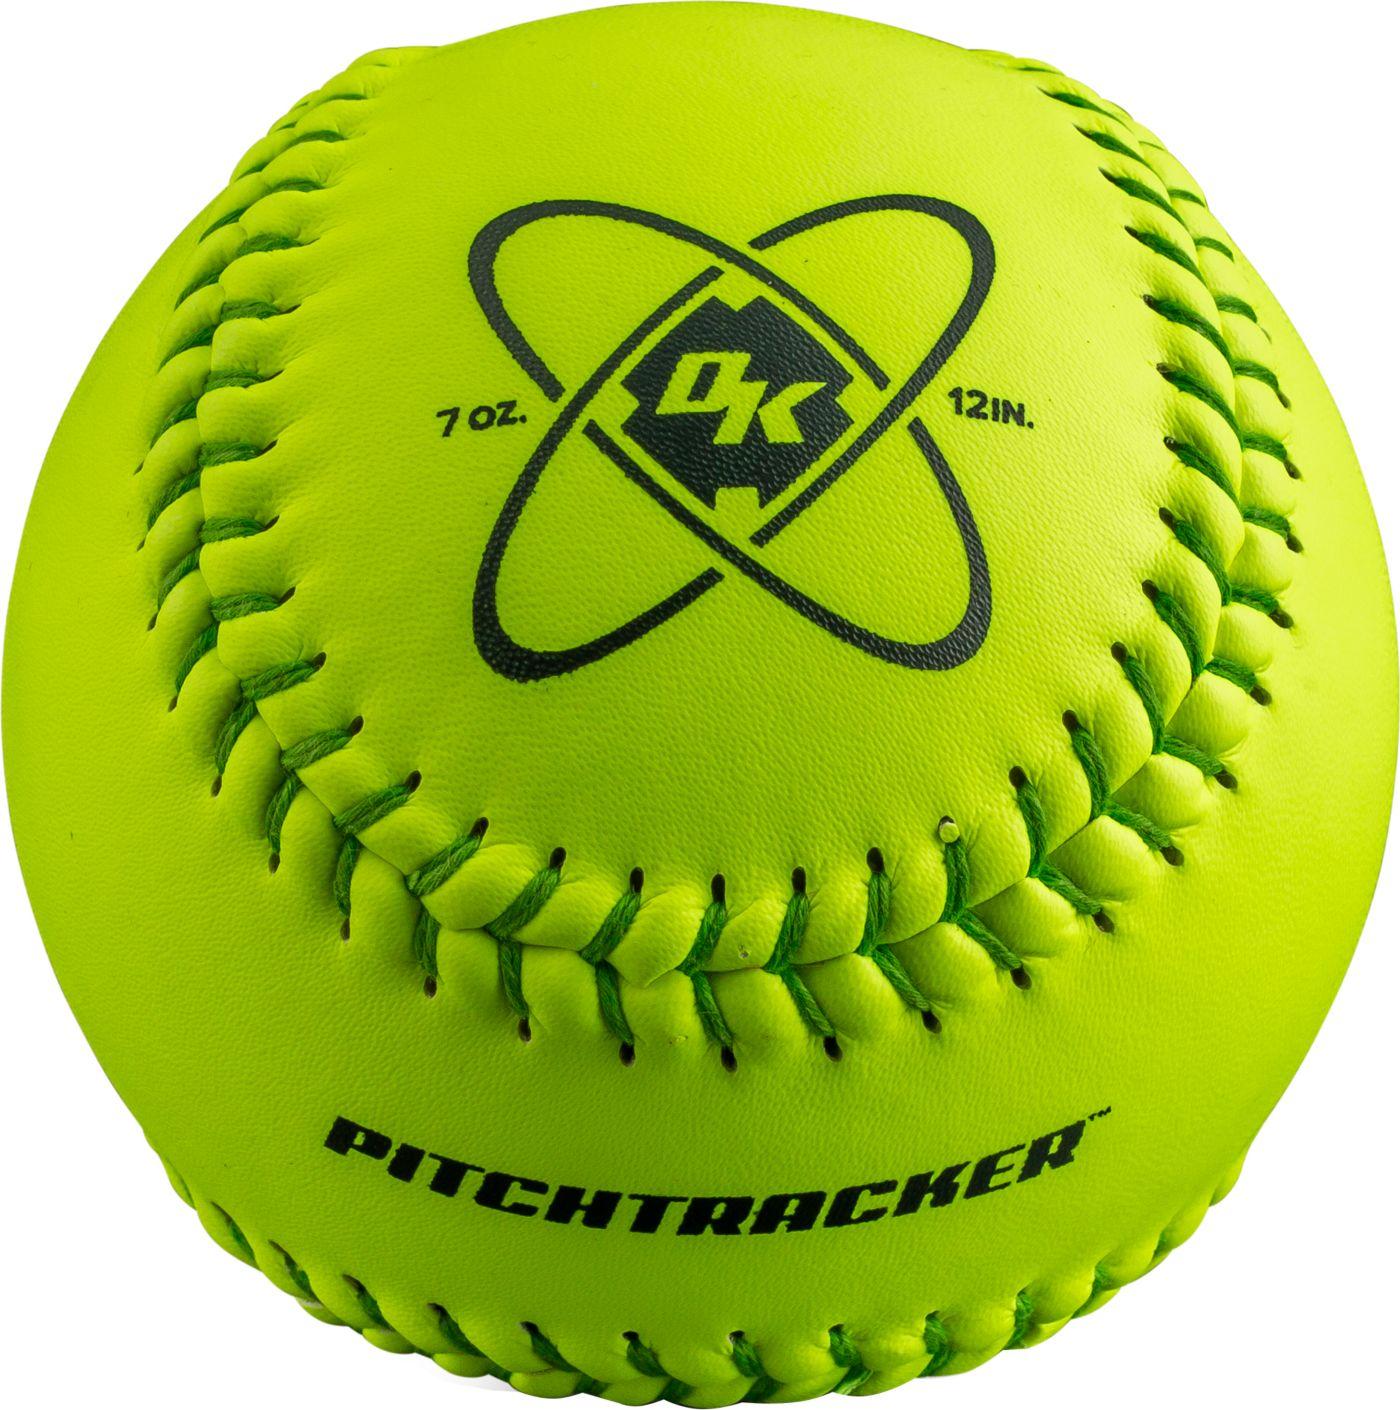 Diamond Kinetics PitchTracker Smart Softball